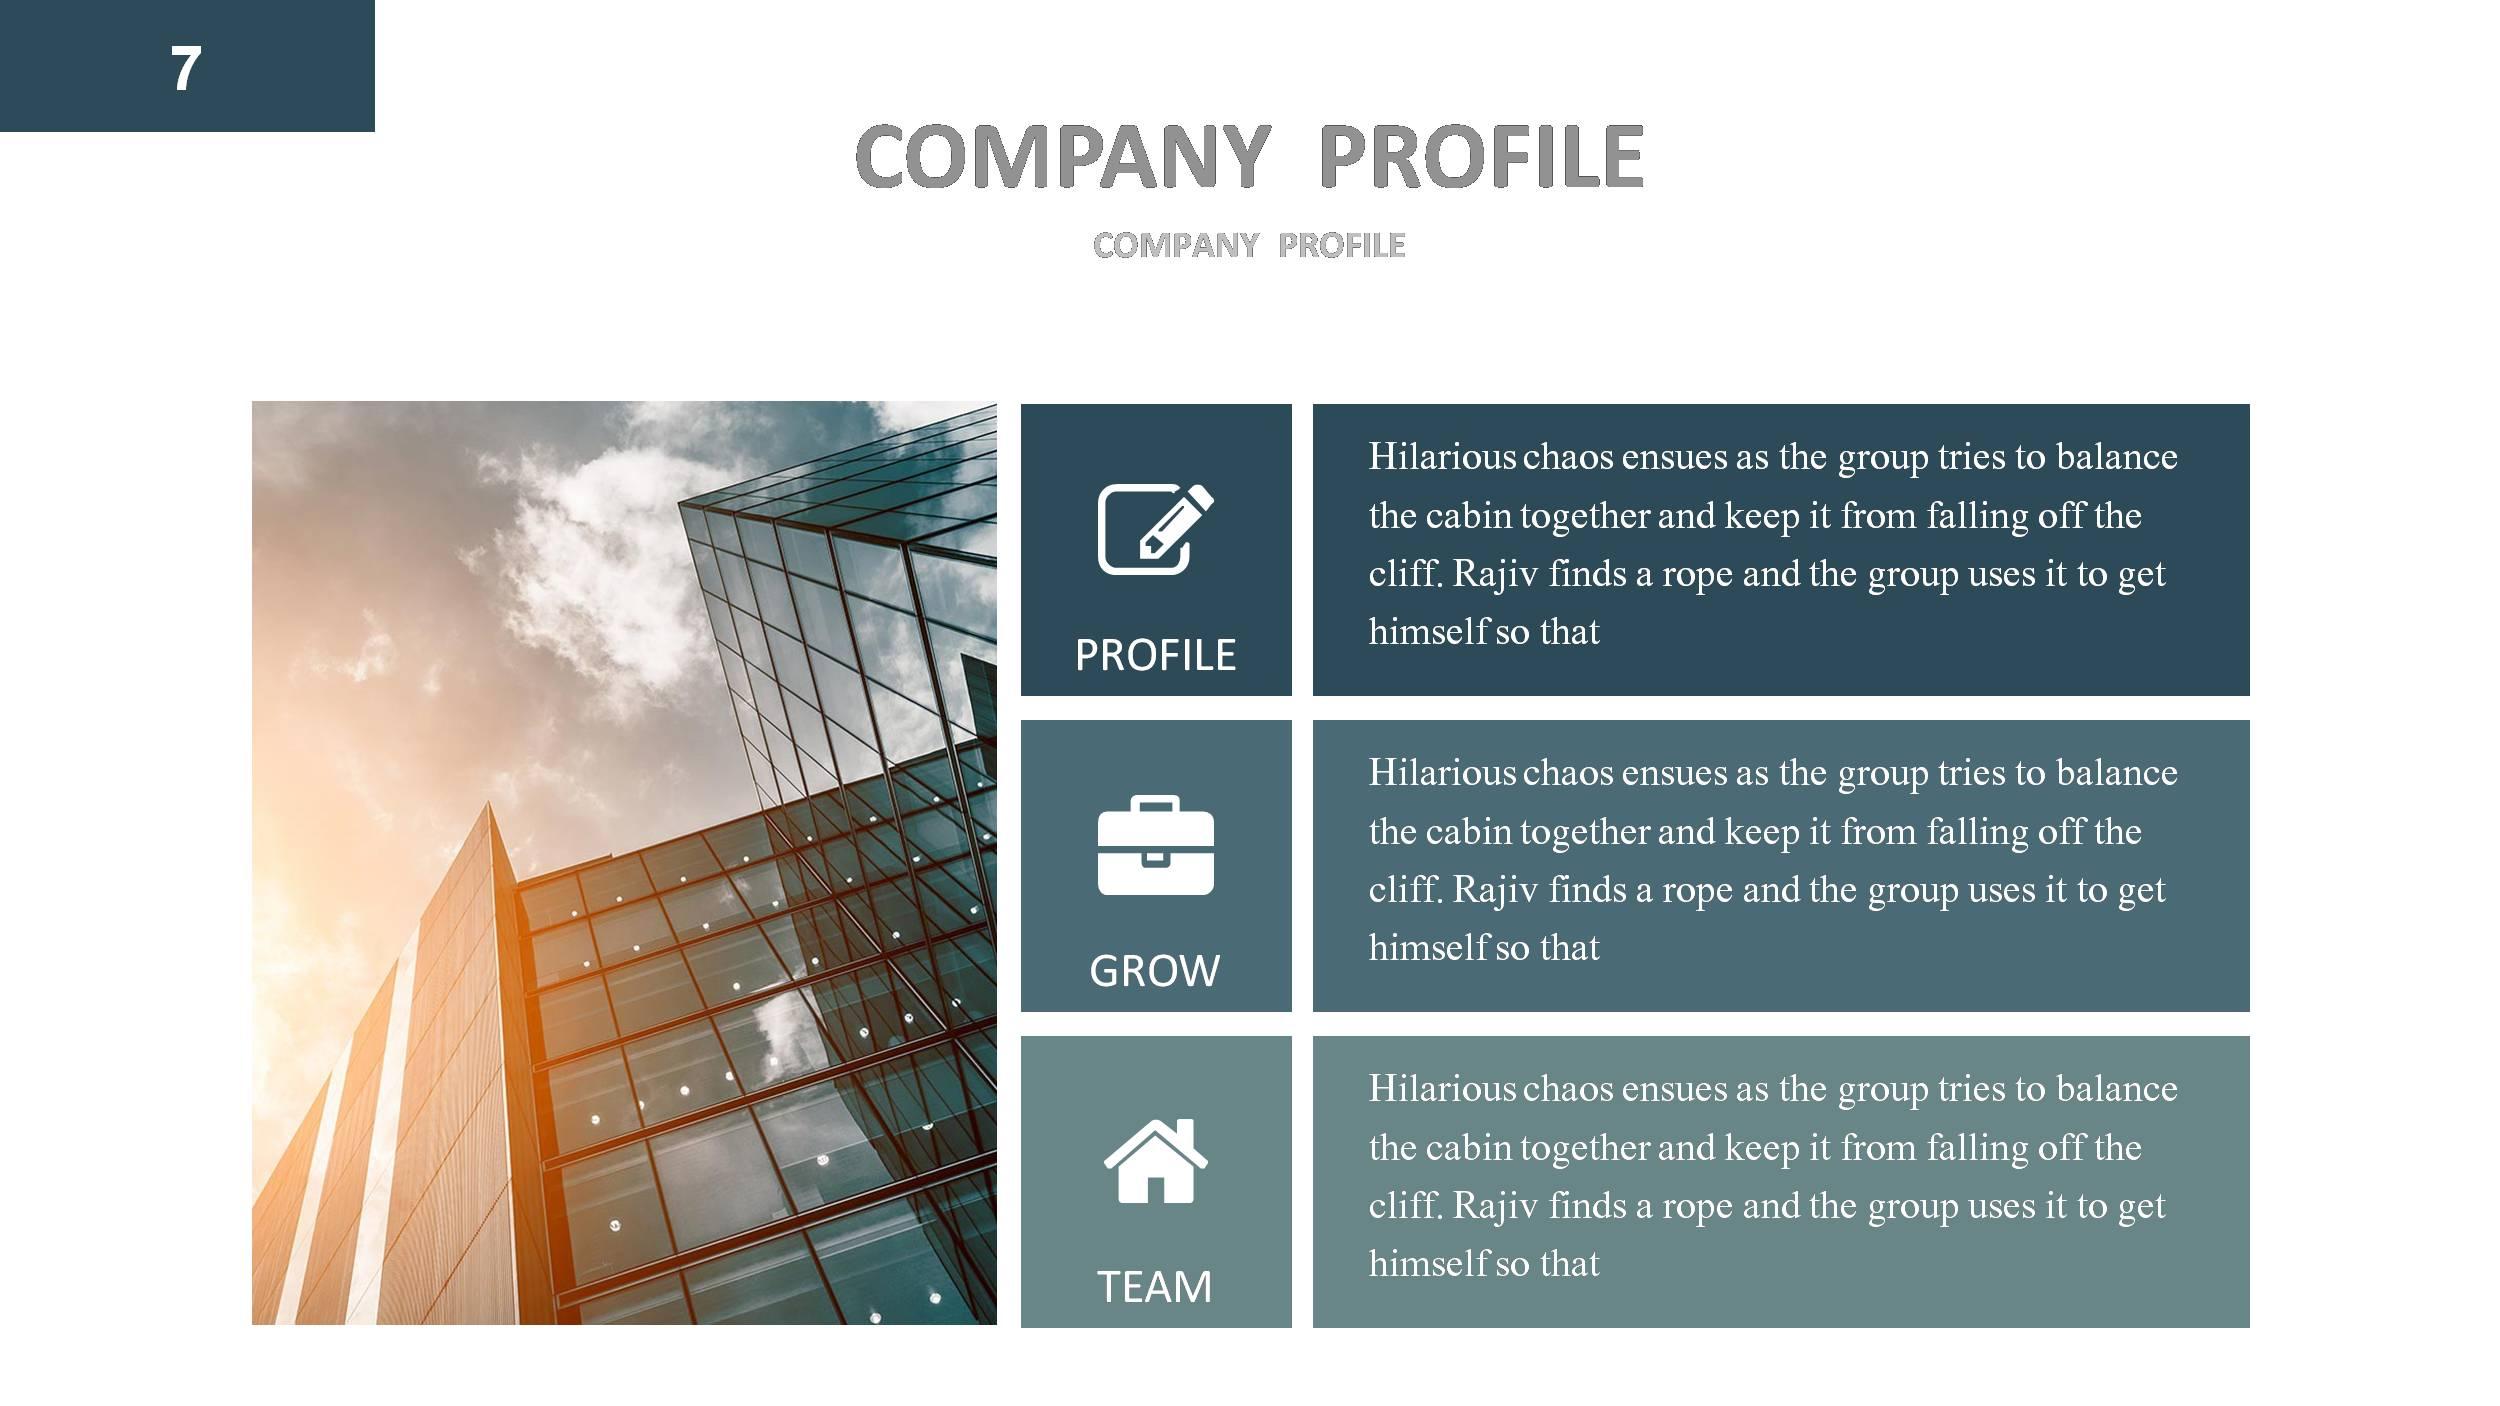 COMPANY PROFILE Keynote Presentation Template by GardeniaDesign – Company Profile Template Word